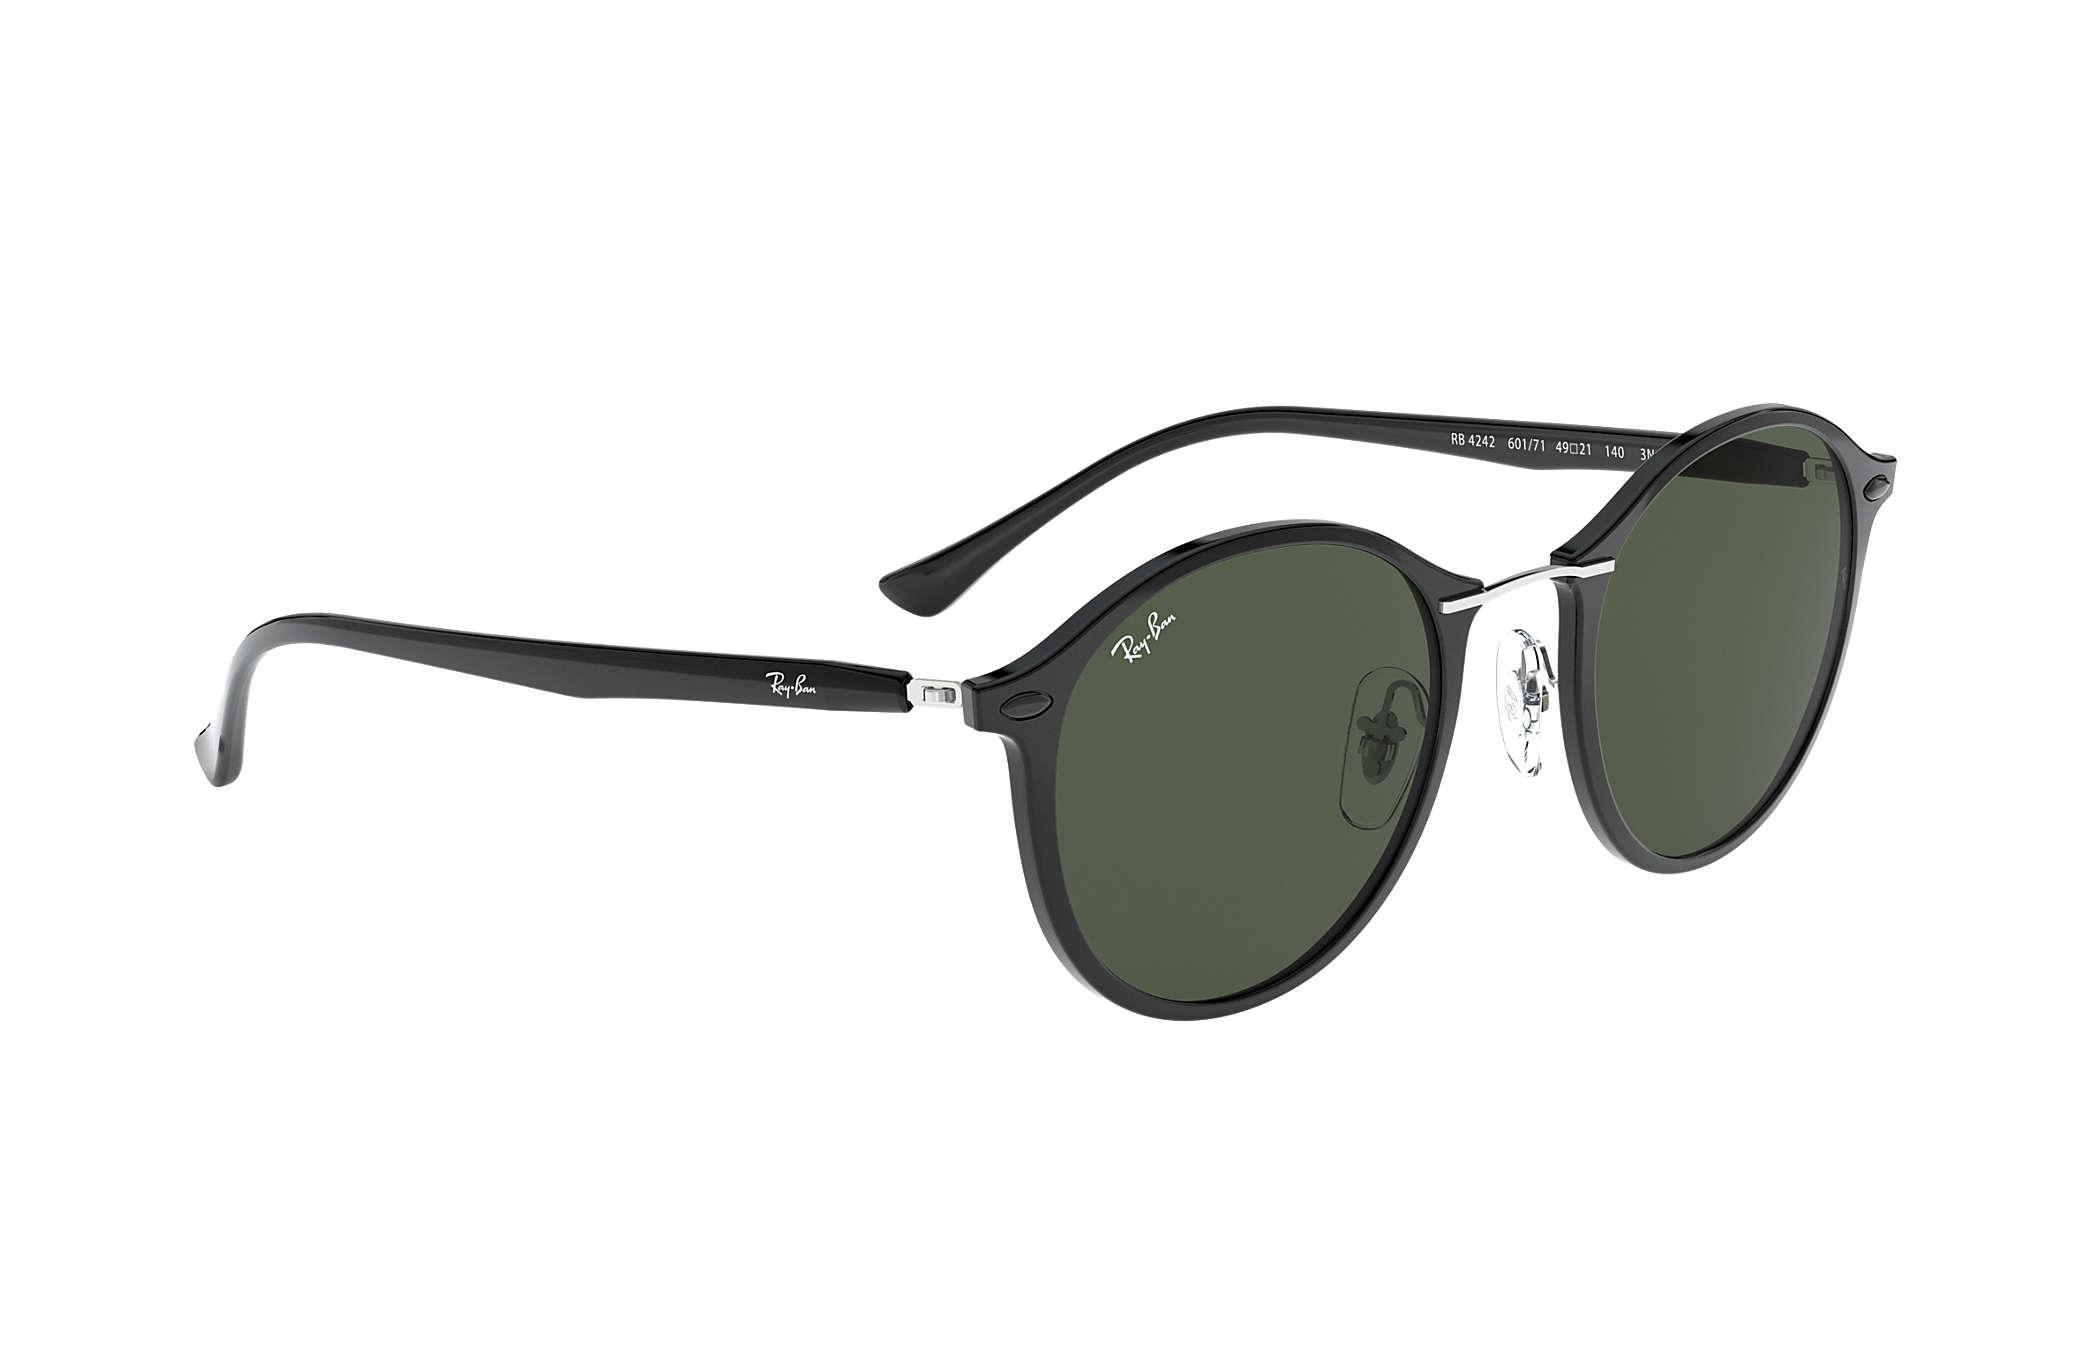 2acab1616f7 Ray-Ban RB4242 Black - LightRay Titanium - Green Lenses - 0RB4242601 ...